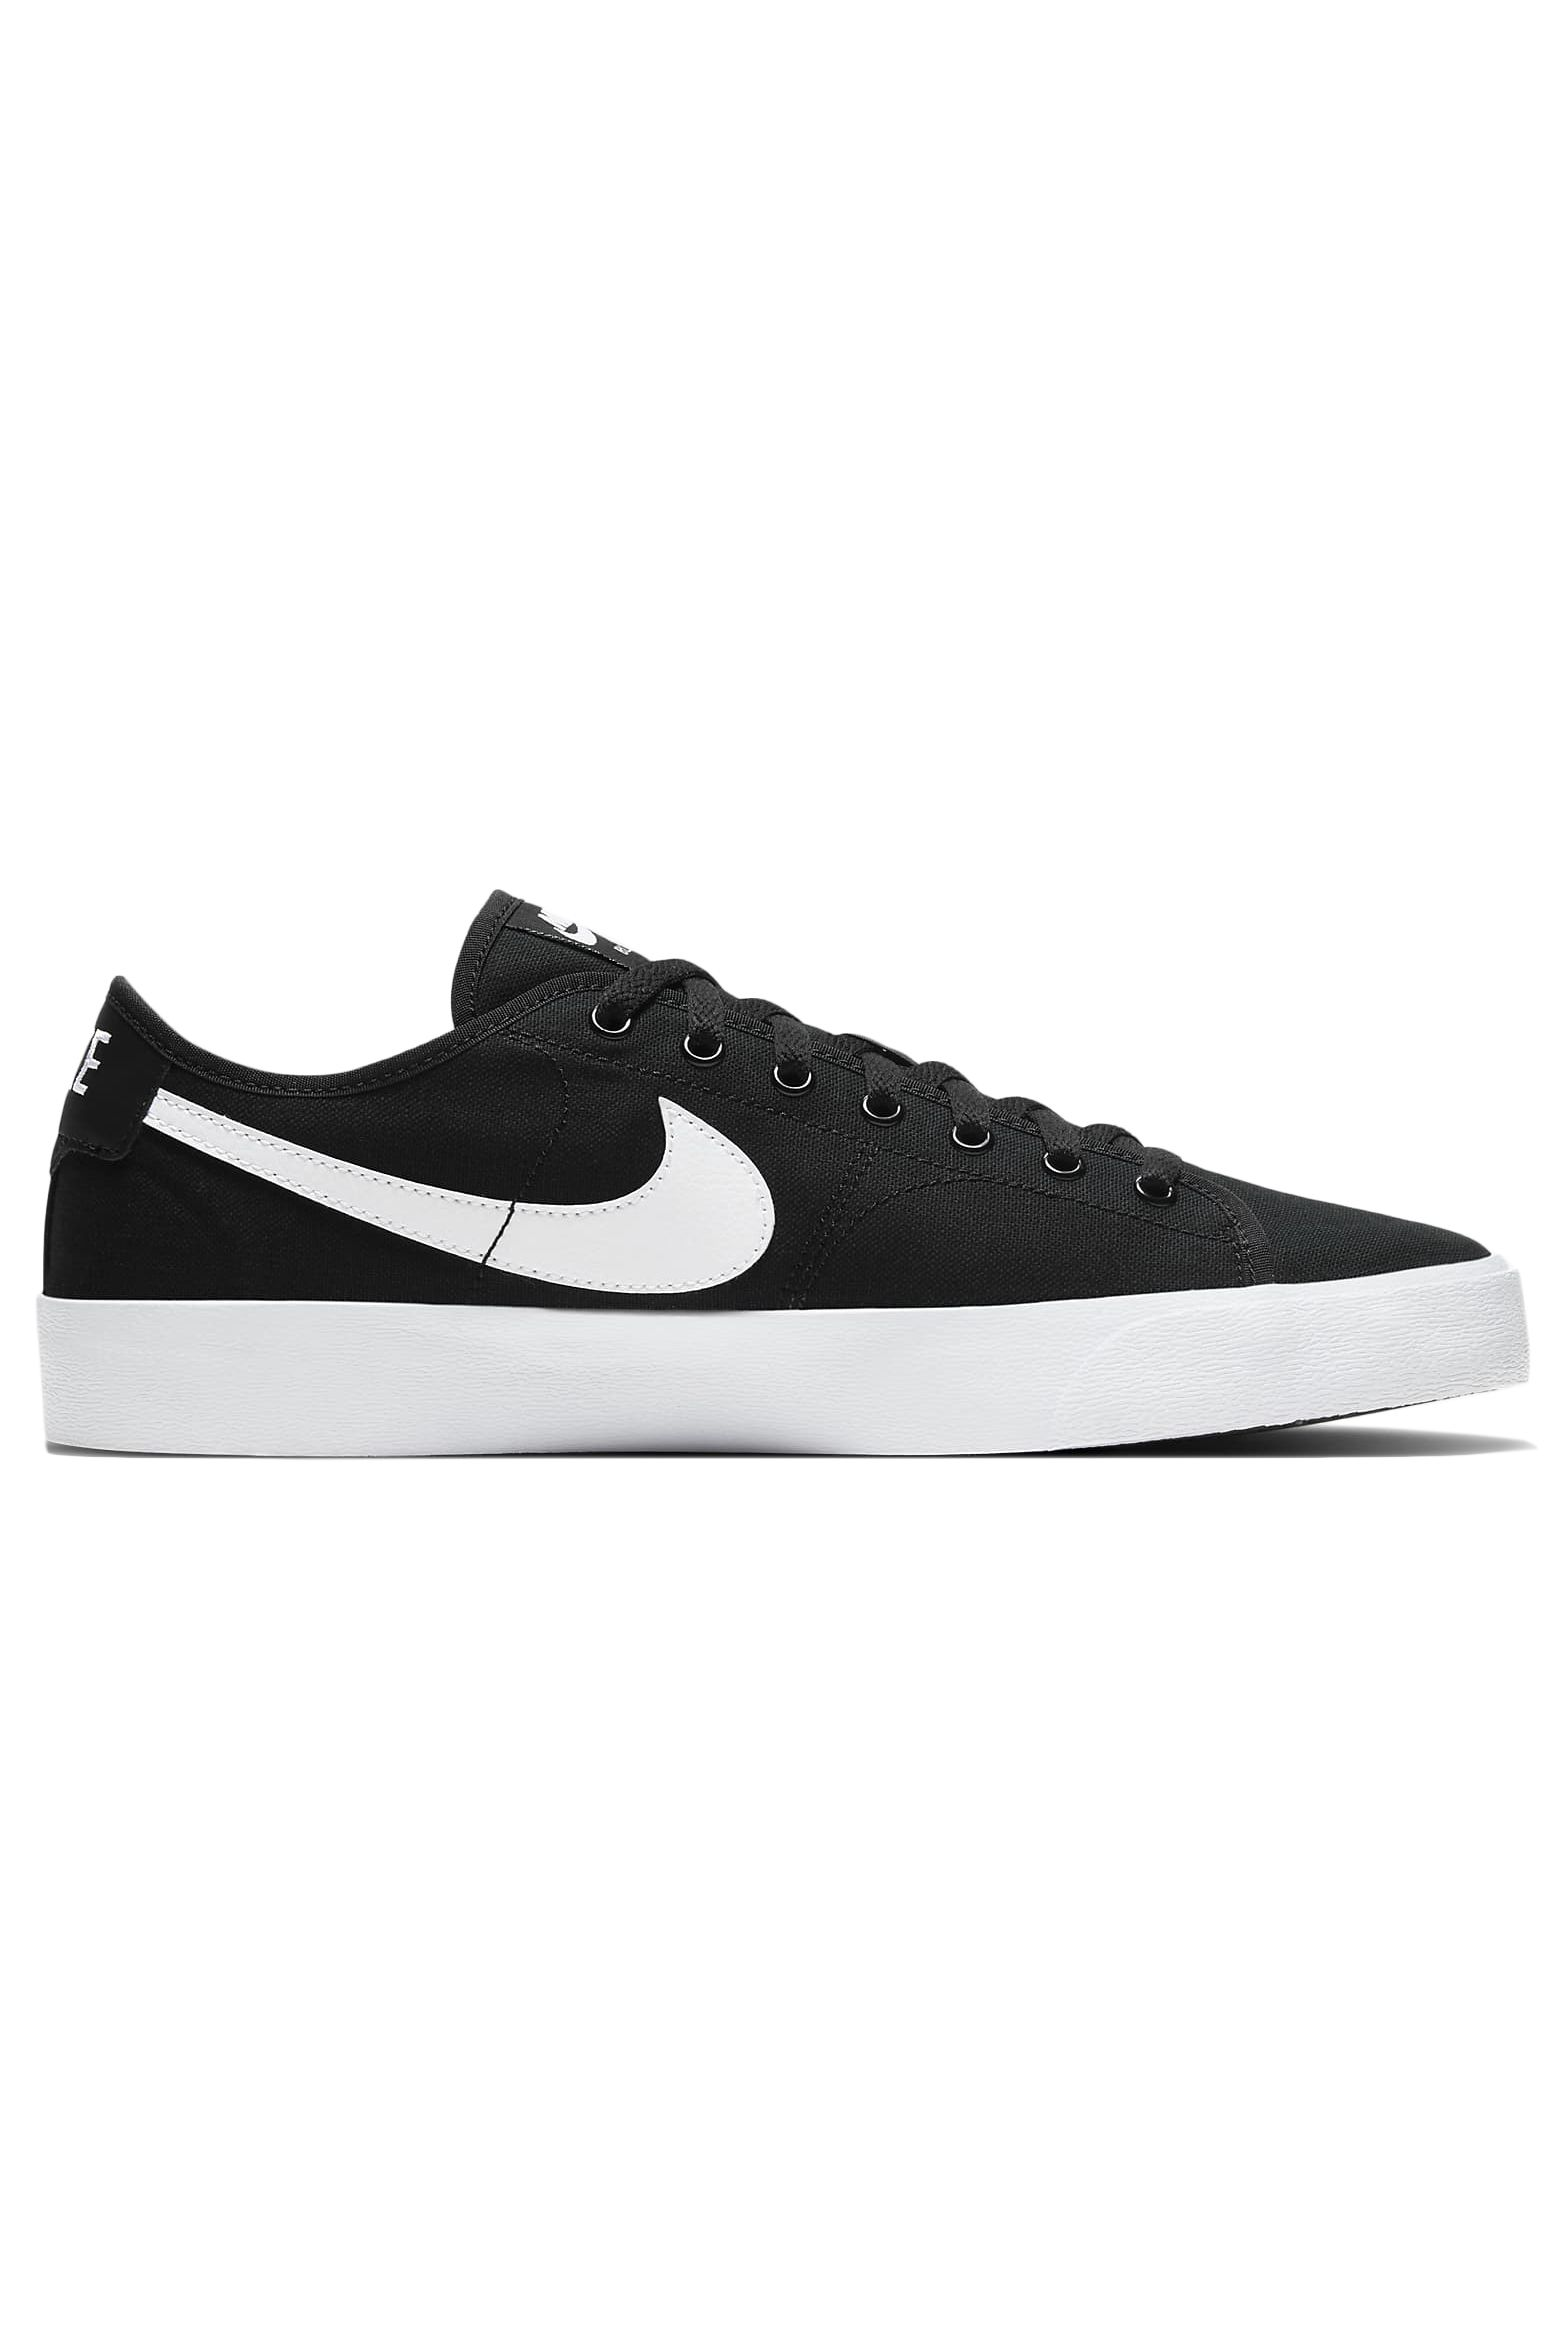 Nike Sb Shoes BLAZER COURT Black/White-Black-Gum Light Brown